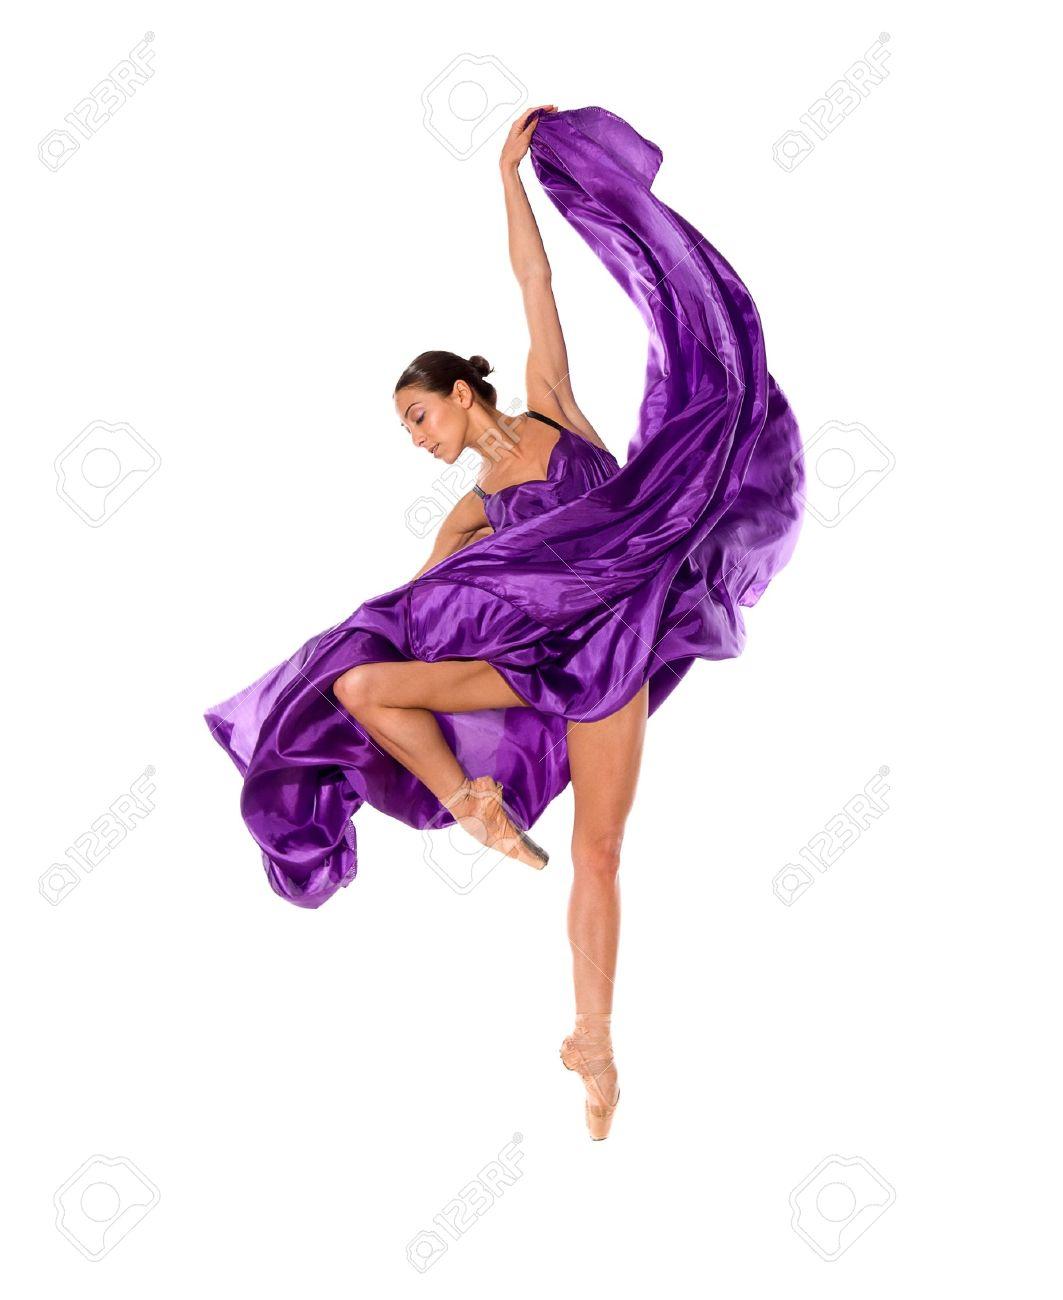 ballet dancer in flying satin dress isolated on white background Stock Photo - 14936037